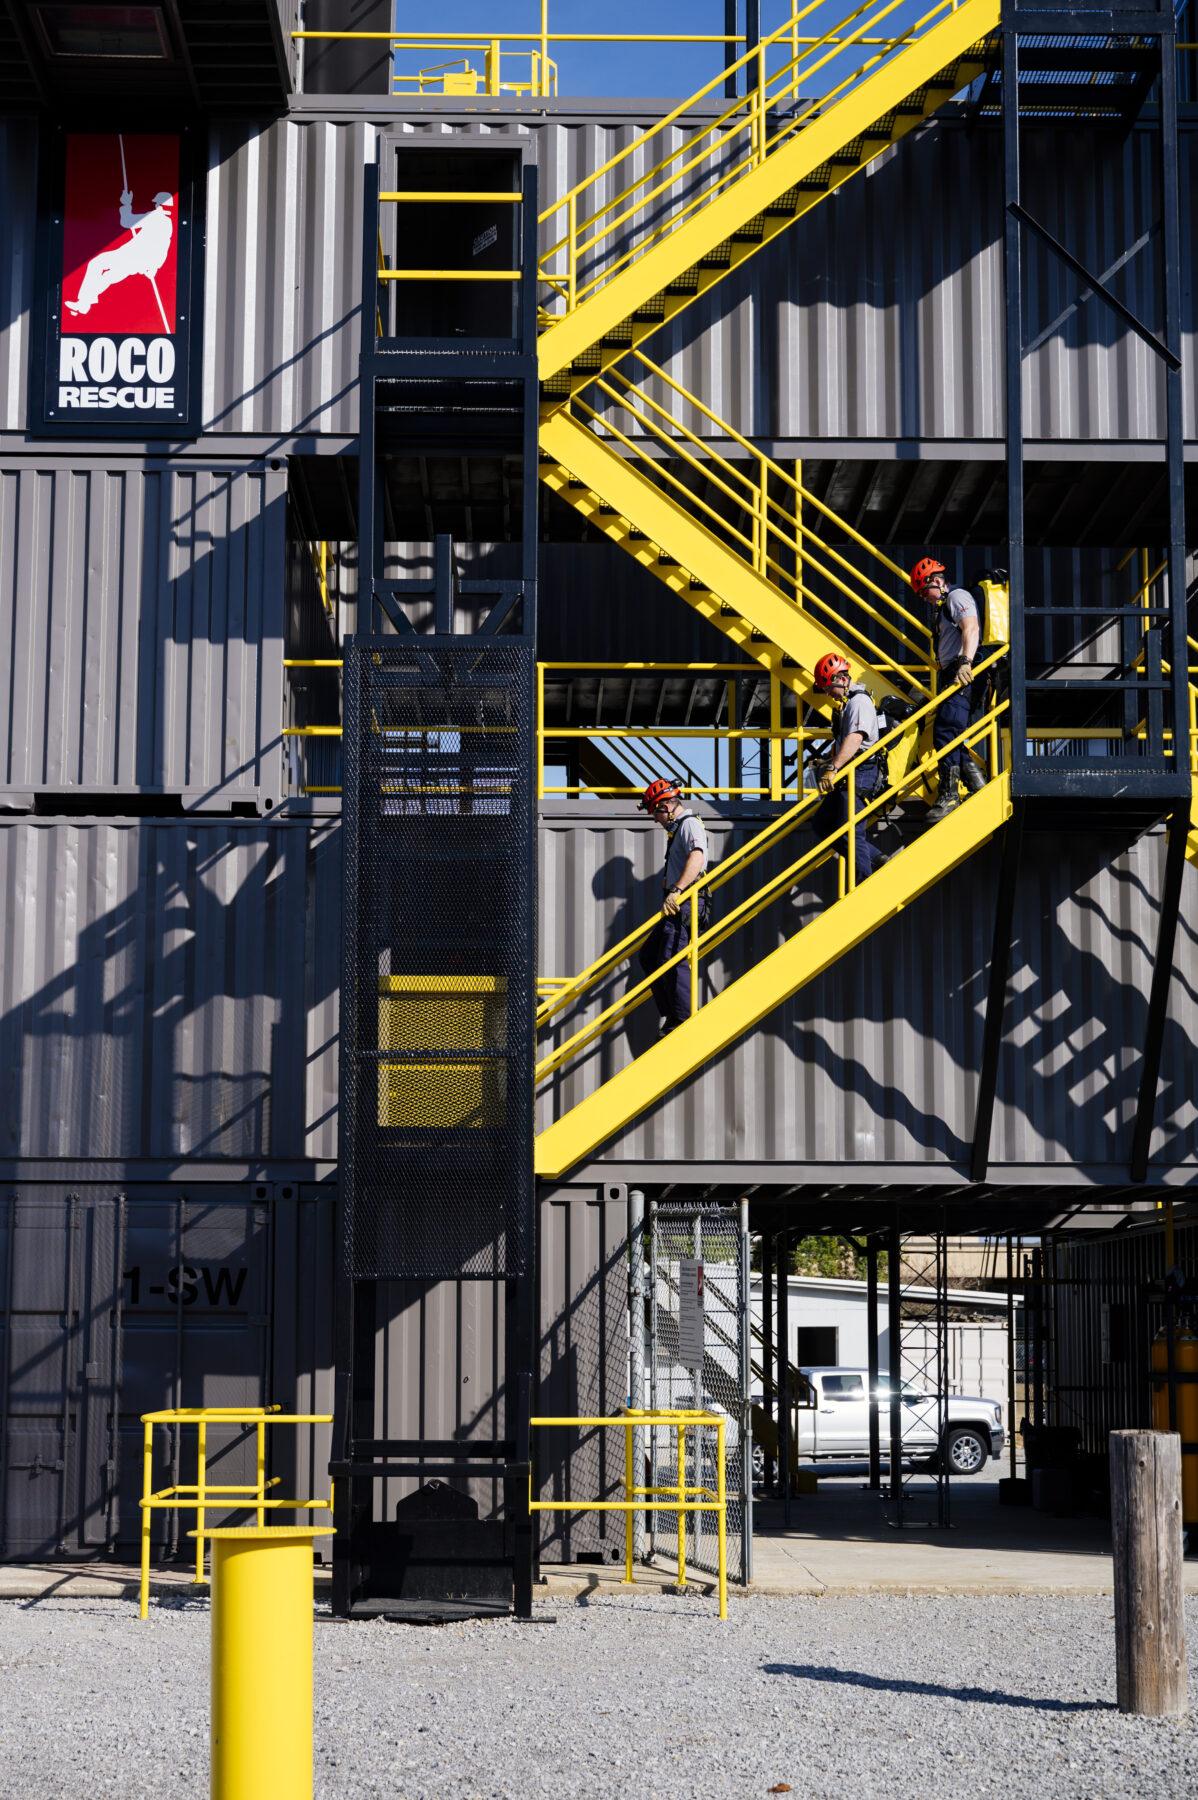 Petzl Technical Partner - Roco Rescue - indoor training facility